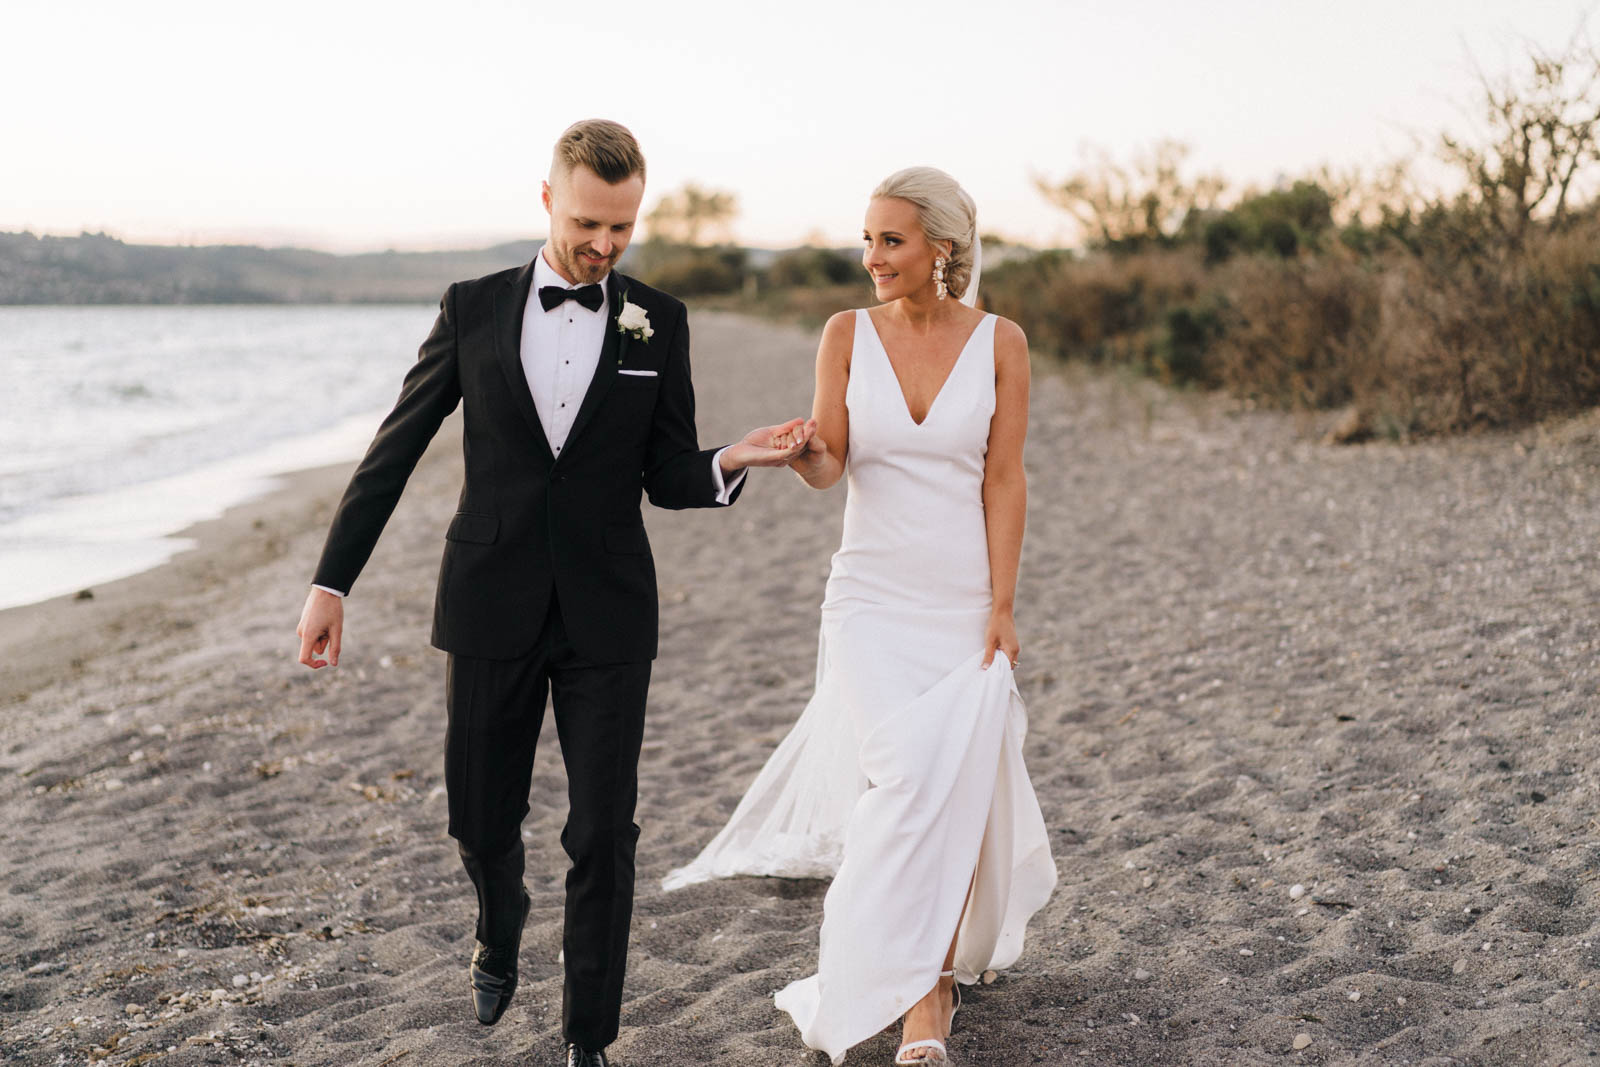 newfound-k-s-hilton-taupo-wedding-photographer-100